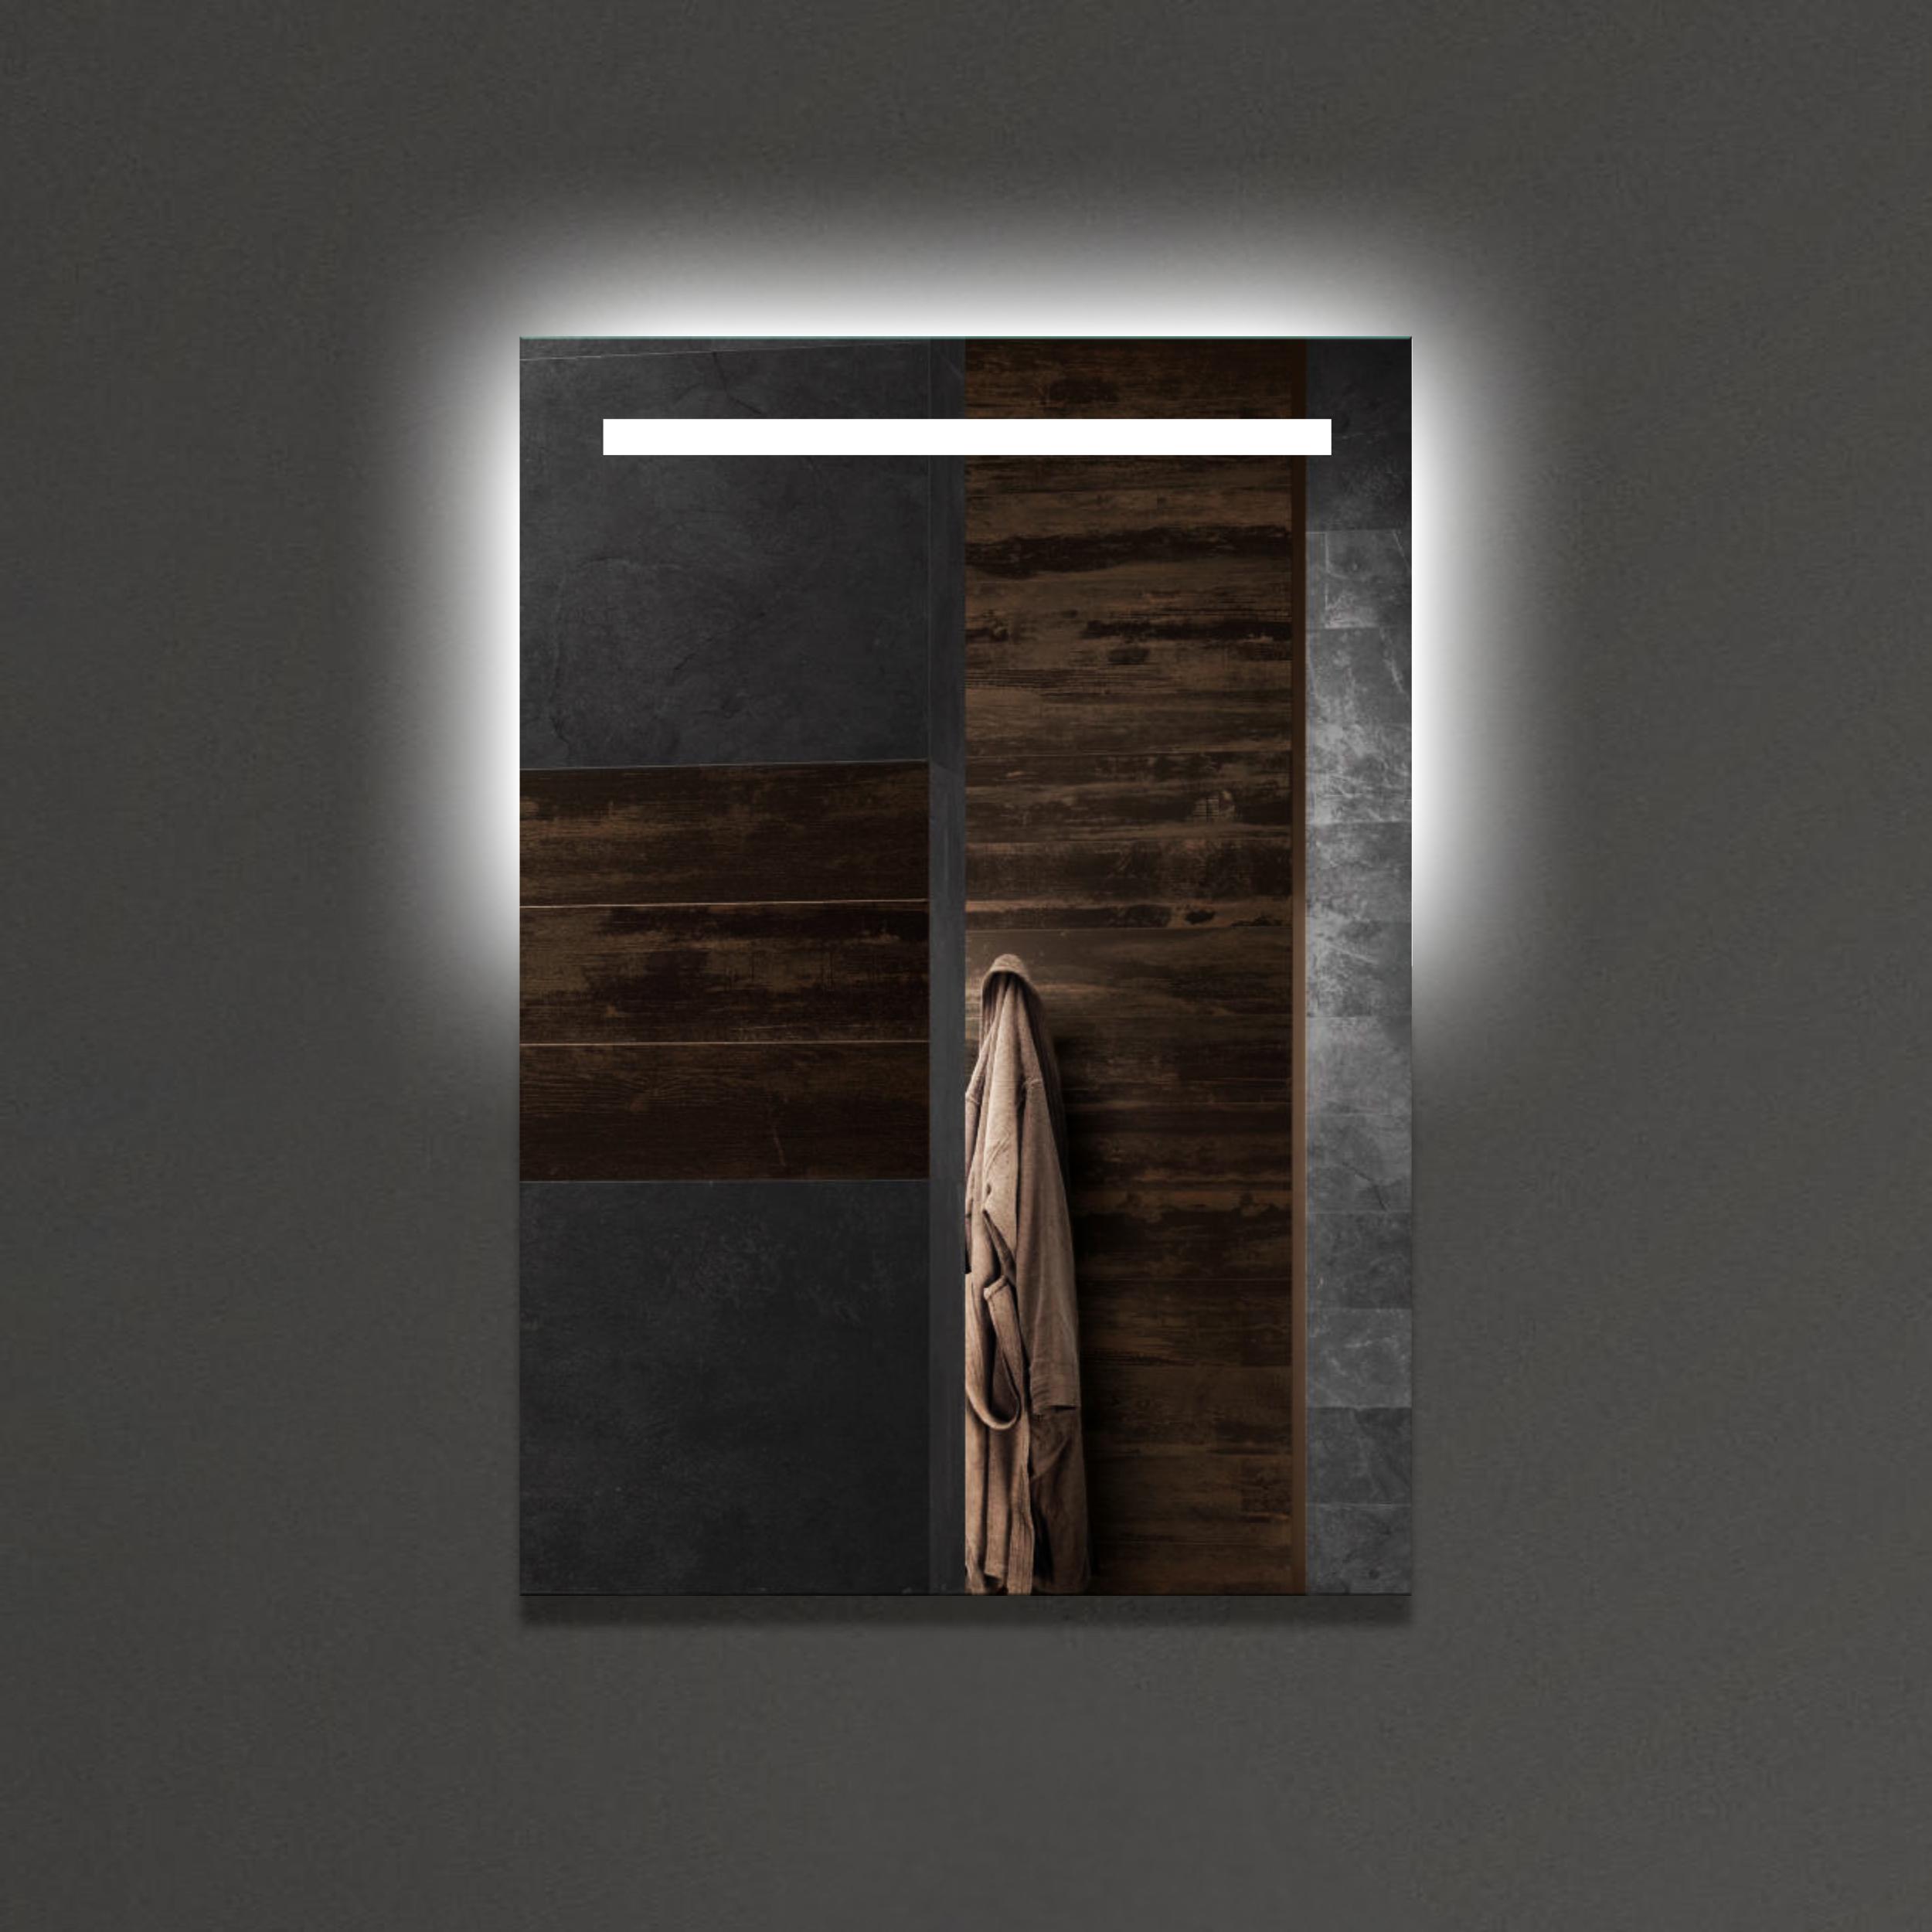 Badspiegel mit LED Beleuchtung LED Spiegel Beleuchtet Wandspiegel  Lichtspiegel Badezimmerspiegel 50 x 70 cm Modell 667475 INVIDIA |  Desto-Shop24